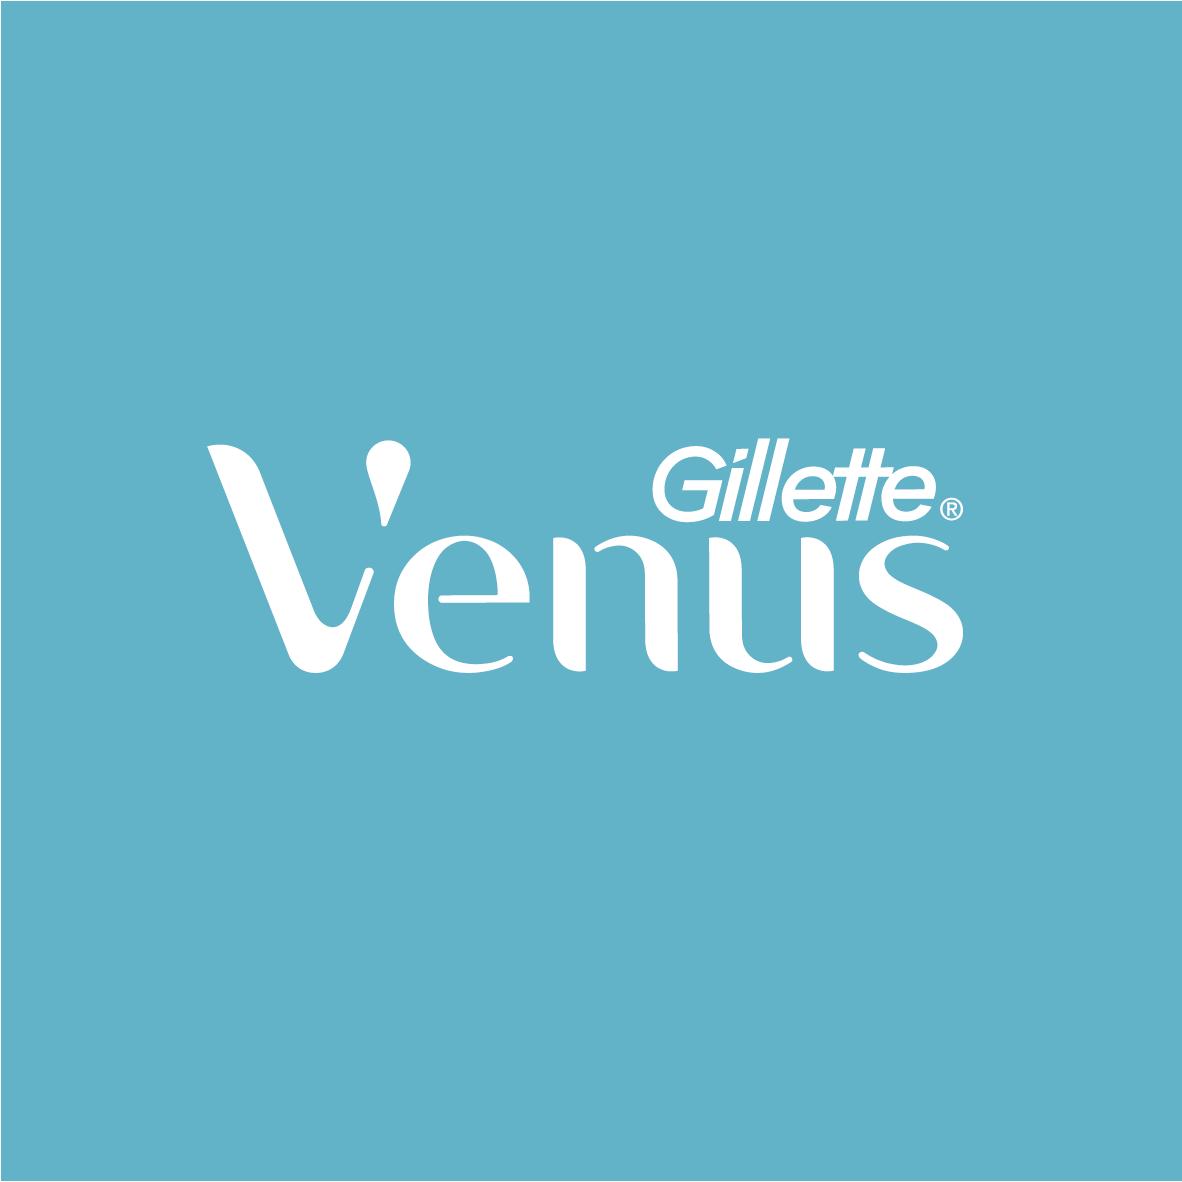 Gilette Venus